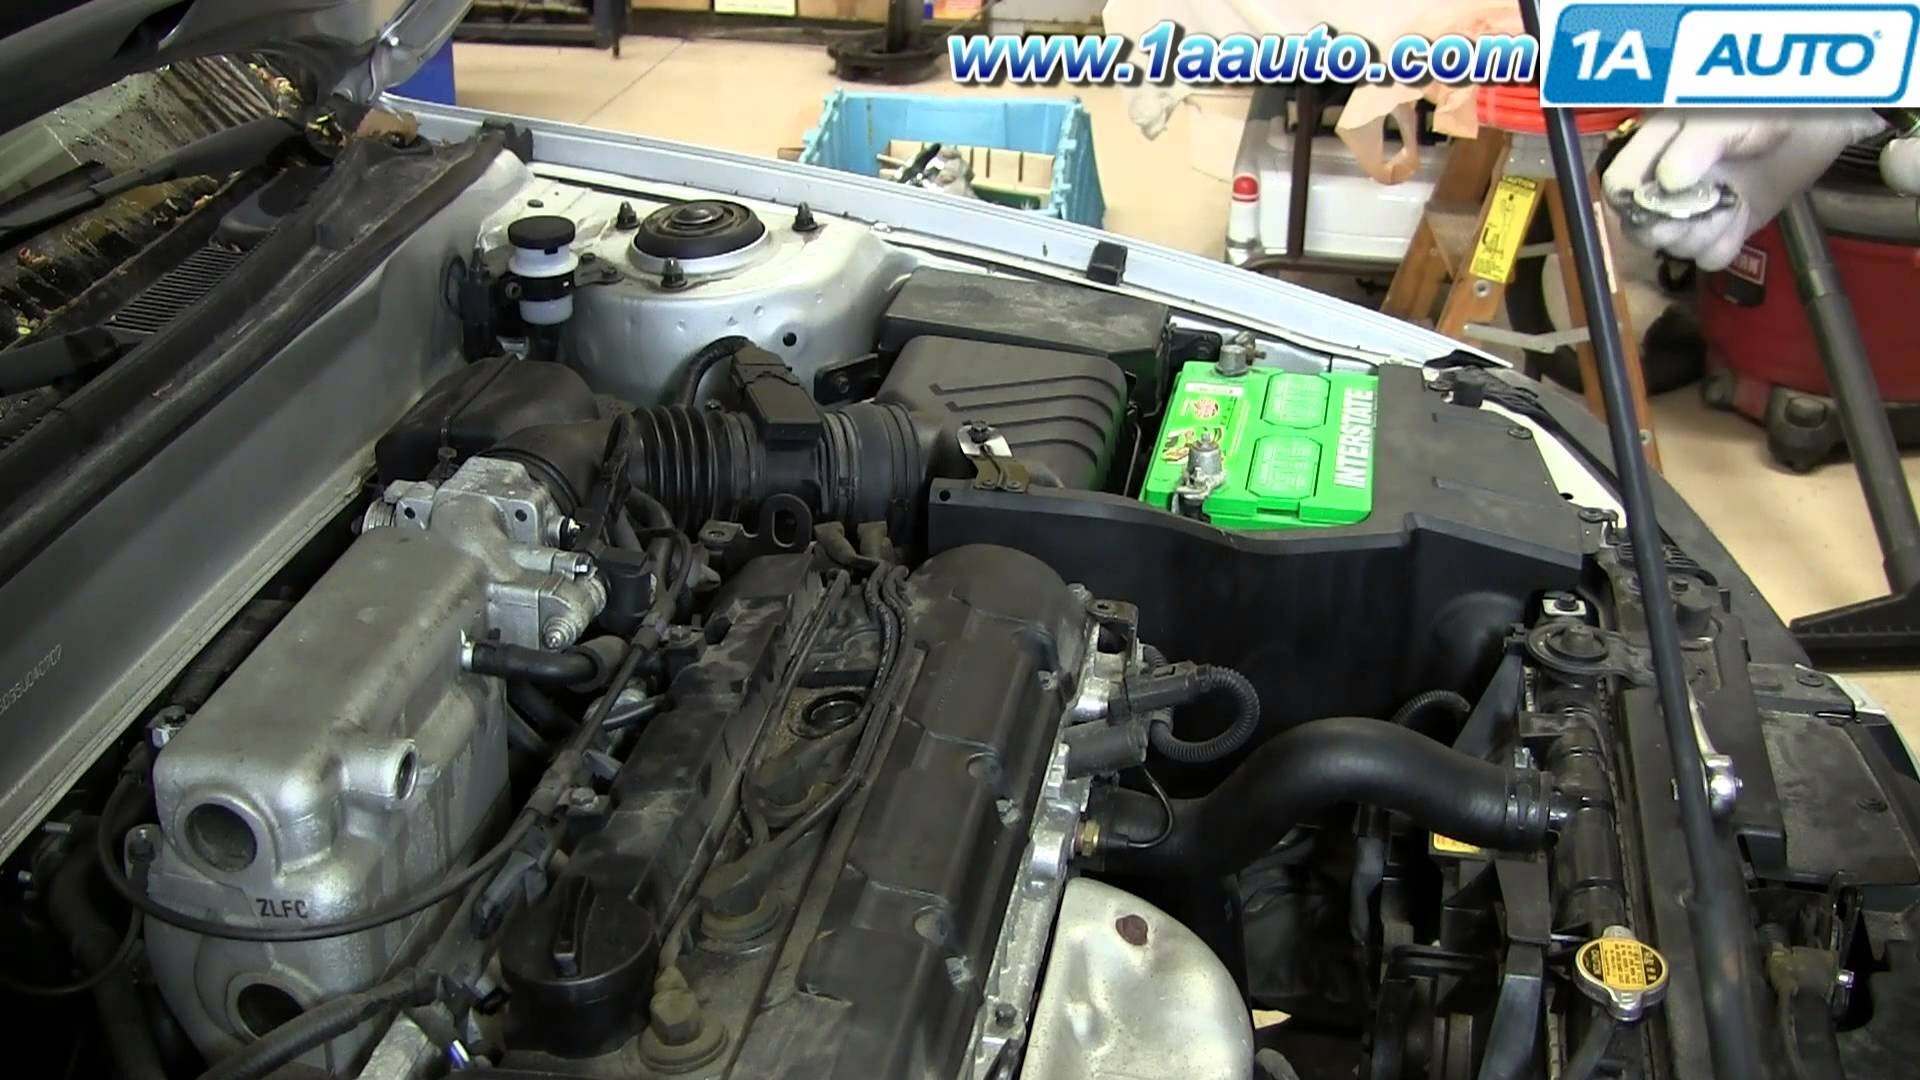 2002 hyundai elantra engine diagram diy wiring diagrams how to install replace